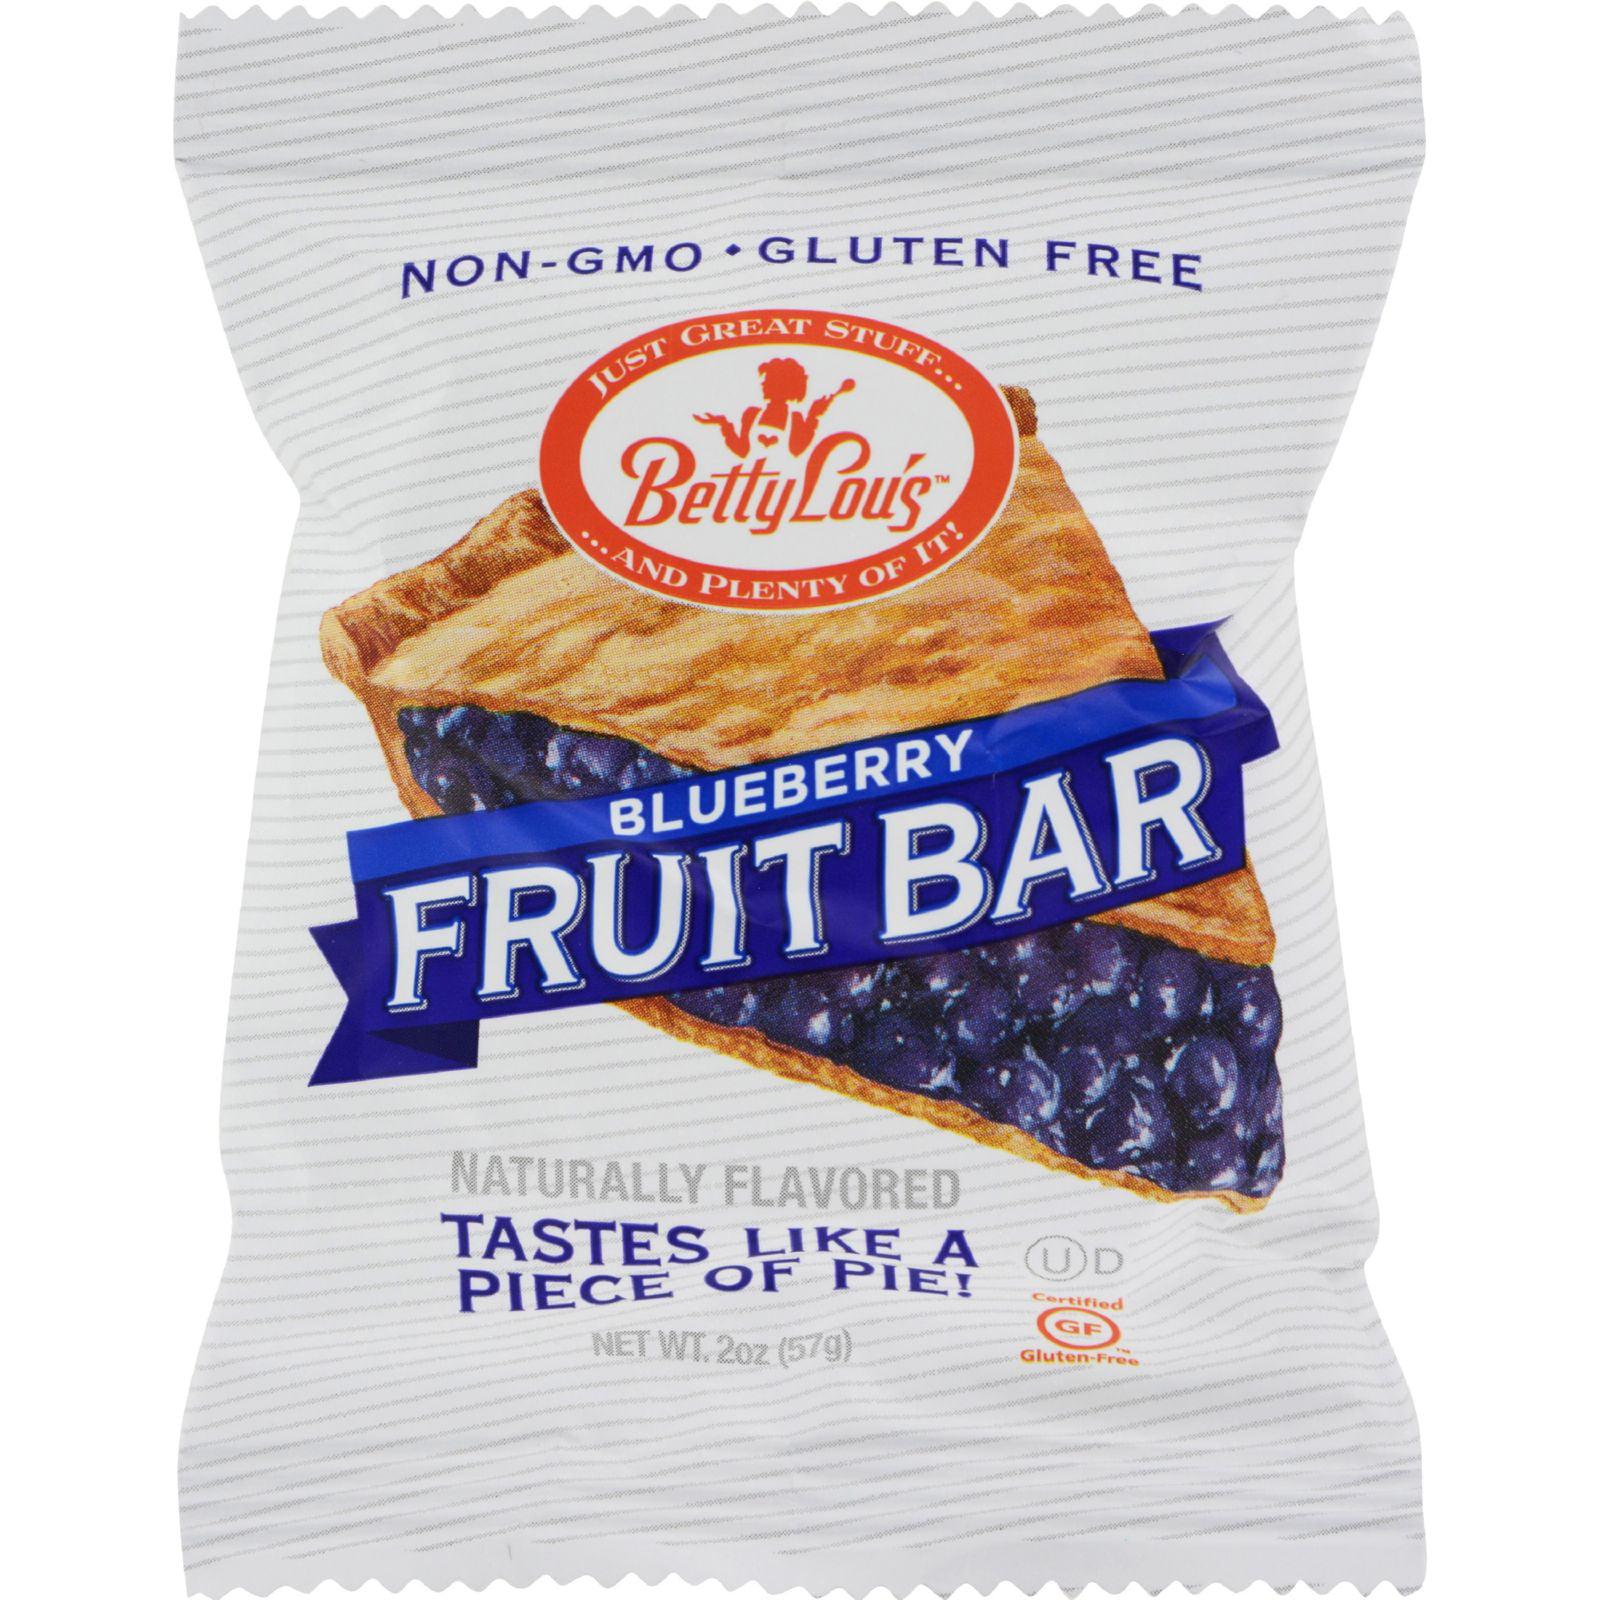 Betty Lou's Gluten Free Fruit Bars Blueberry - 2 oz - Case of 12